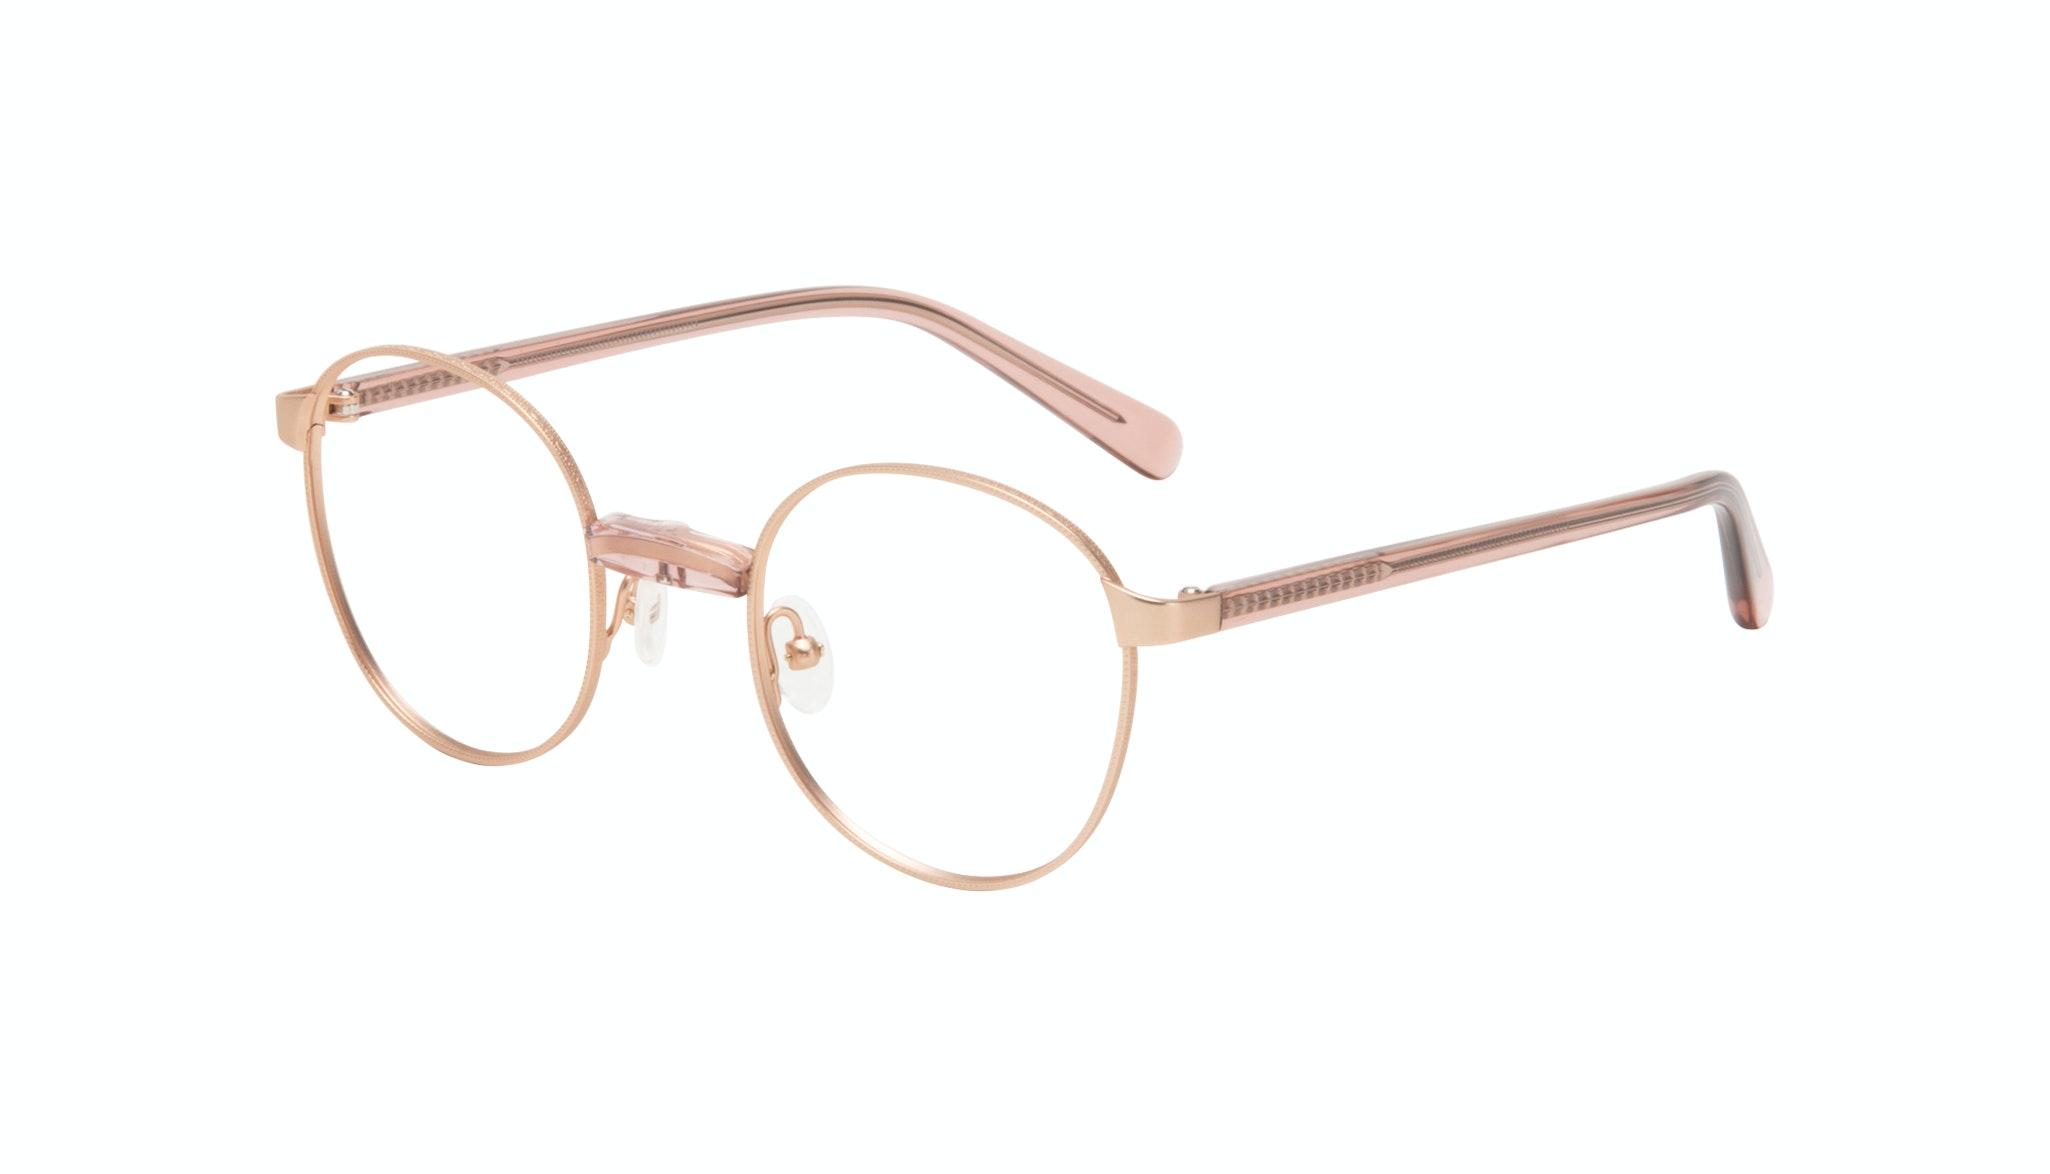 Affordable Fashion Glasses Round Eyeglasses Women Curious Rose Tilt